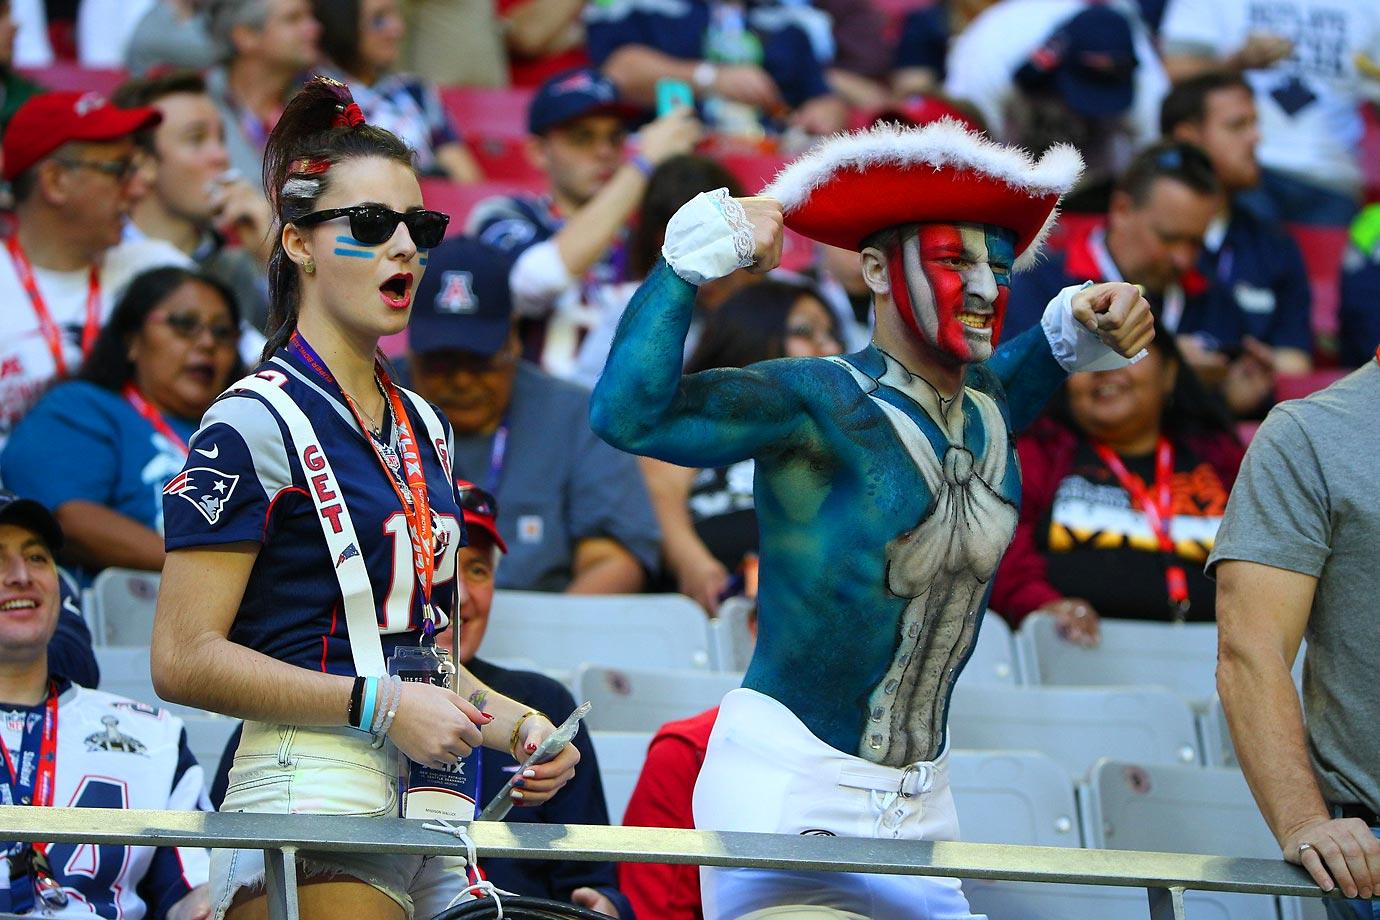 Fans at the Super Bowl